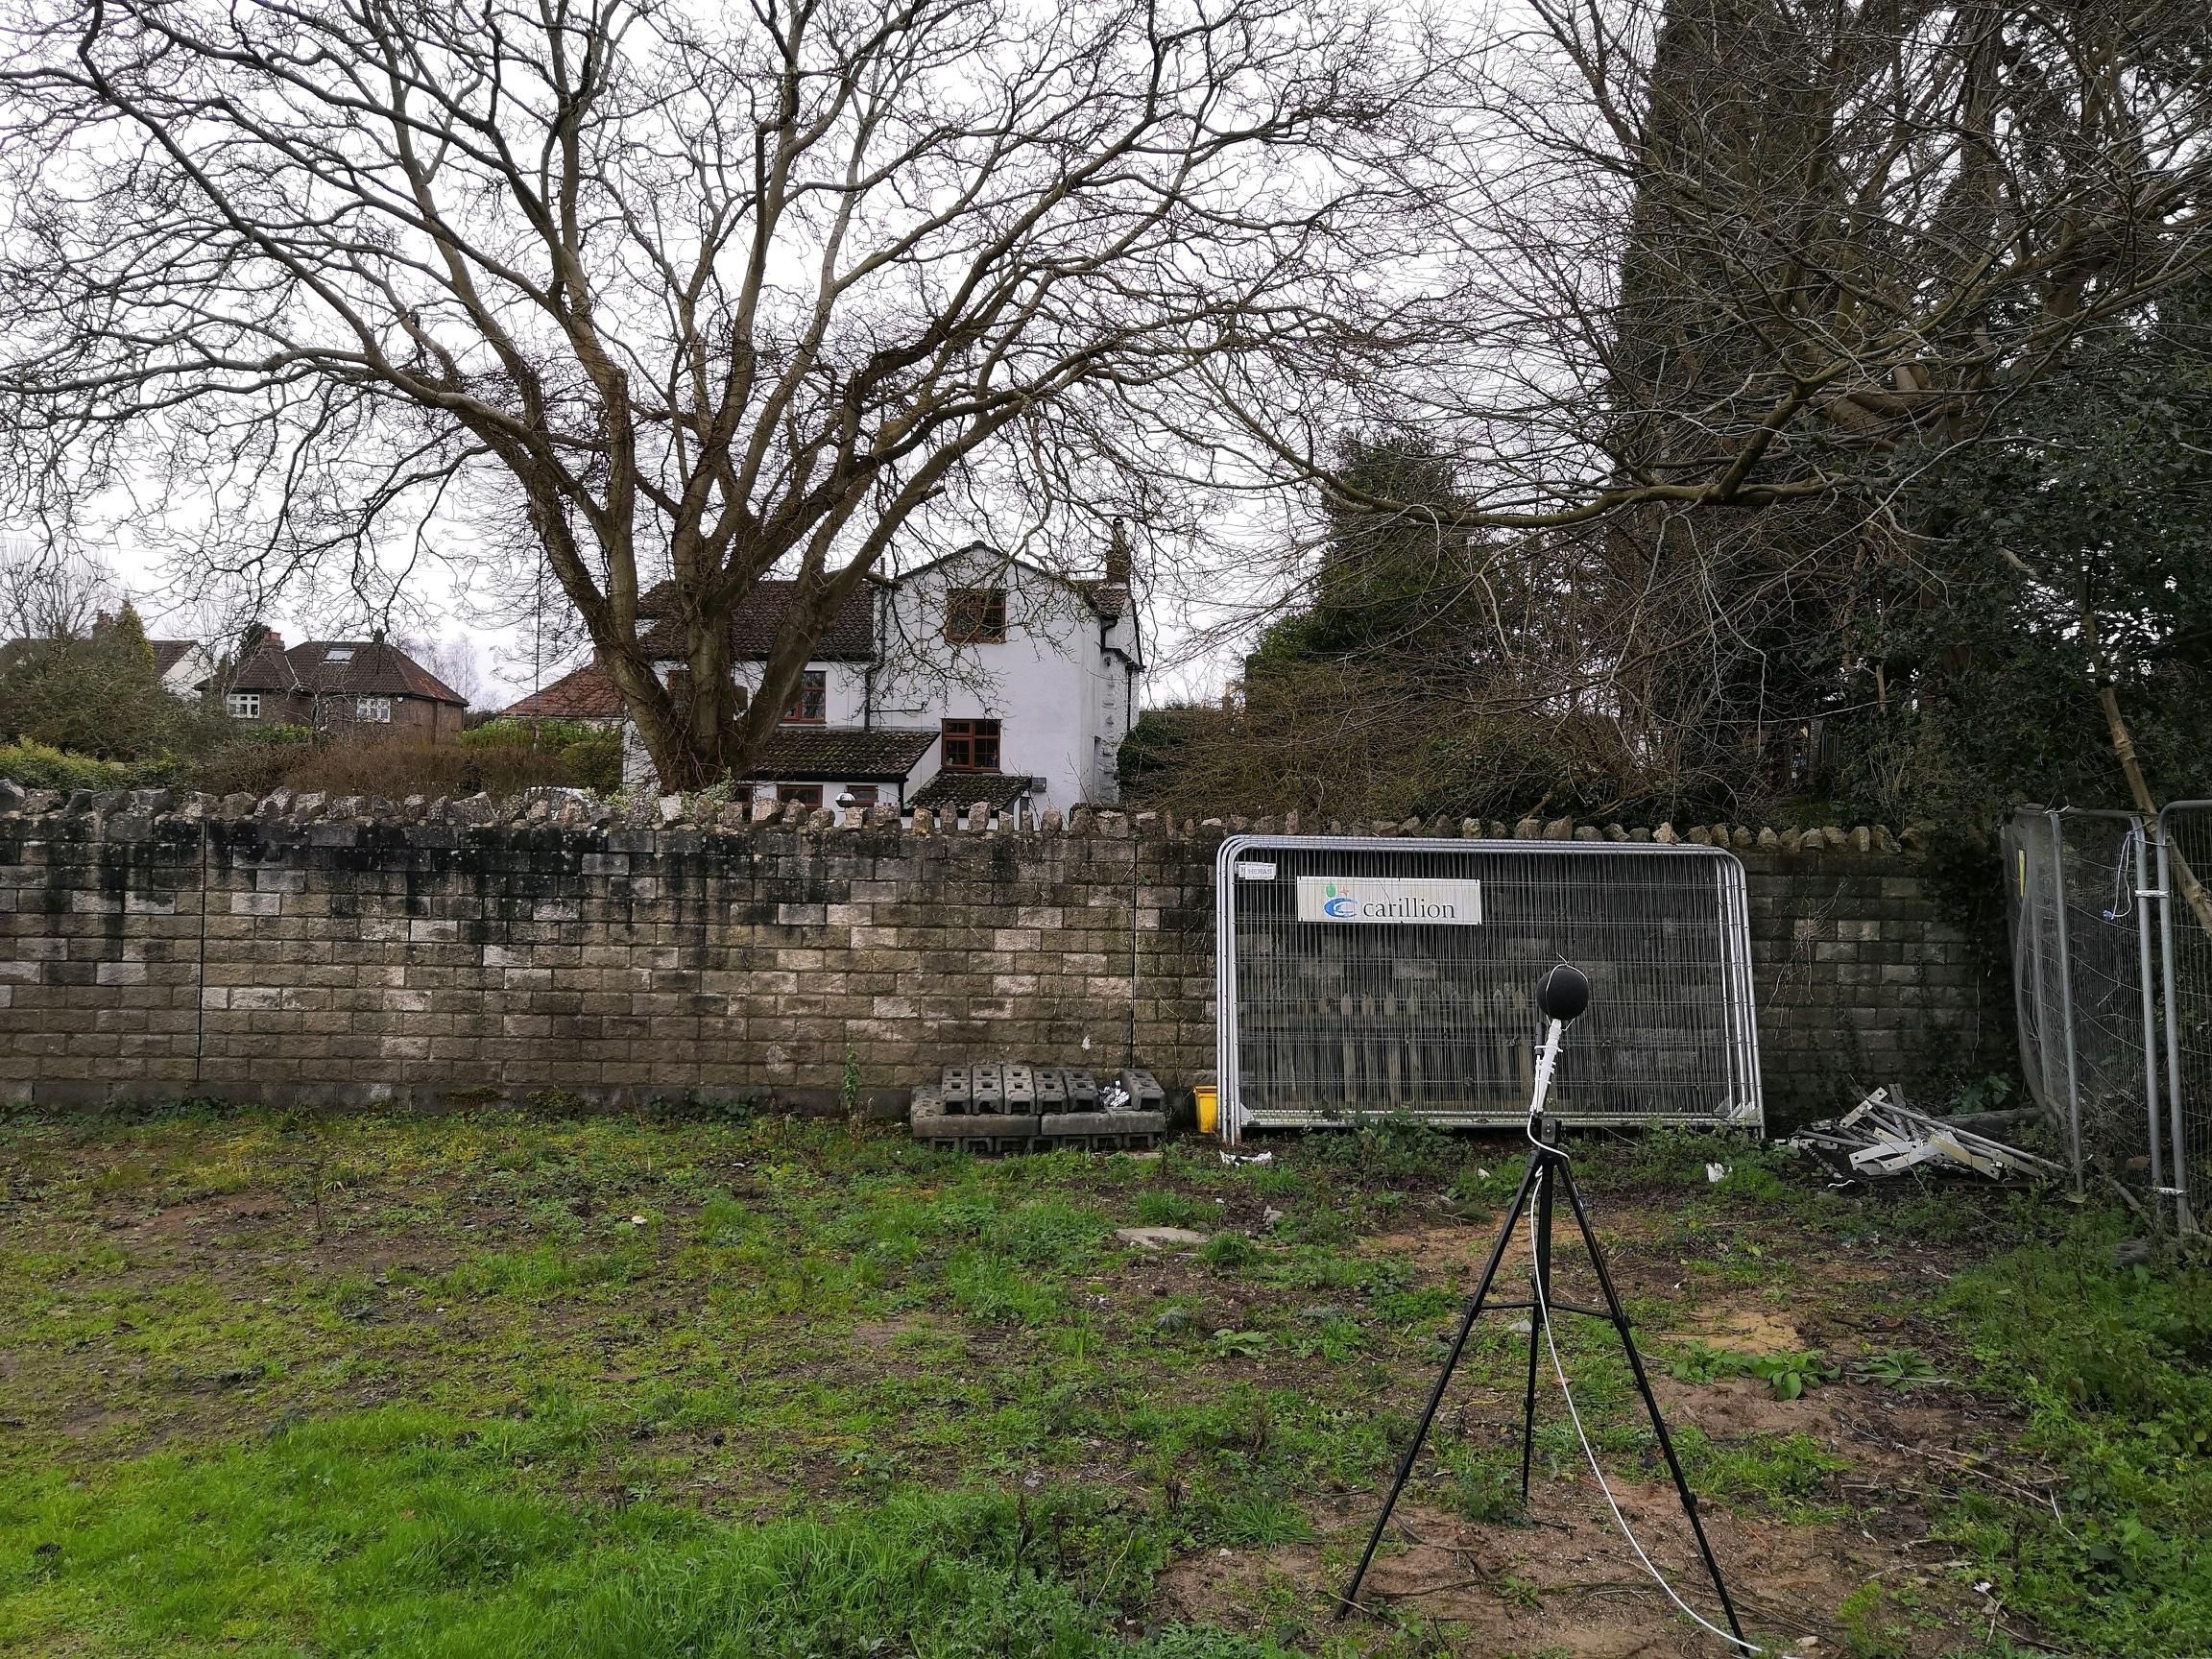 Noise Survey for a Residential Development in Bristol